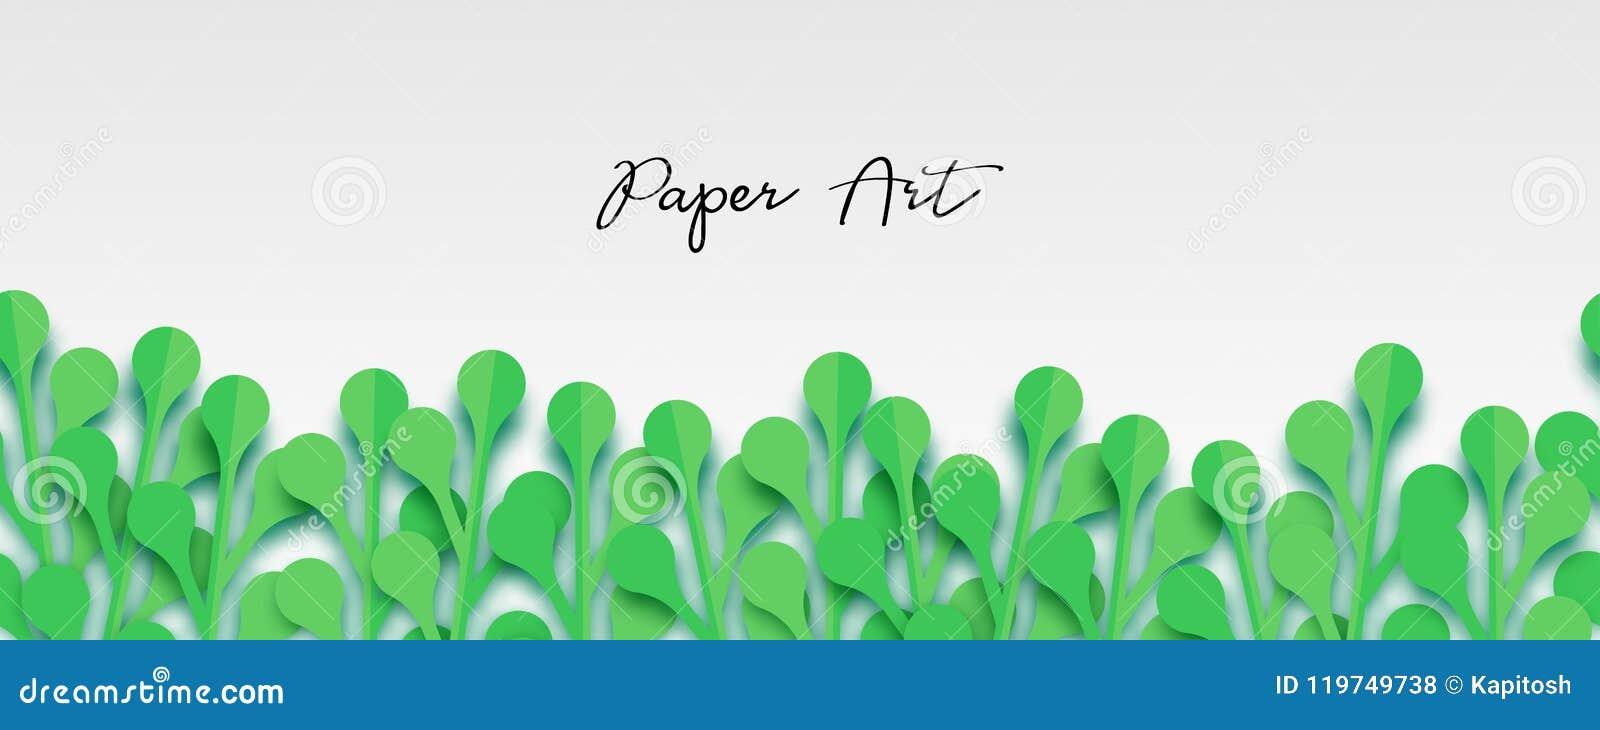 Water plant grass leaf die cutting dies wykrojniki diy.